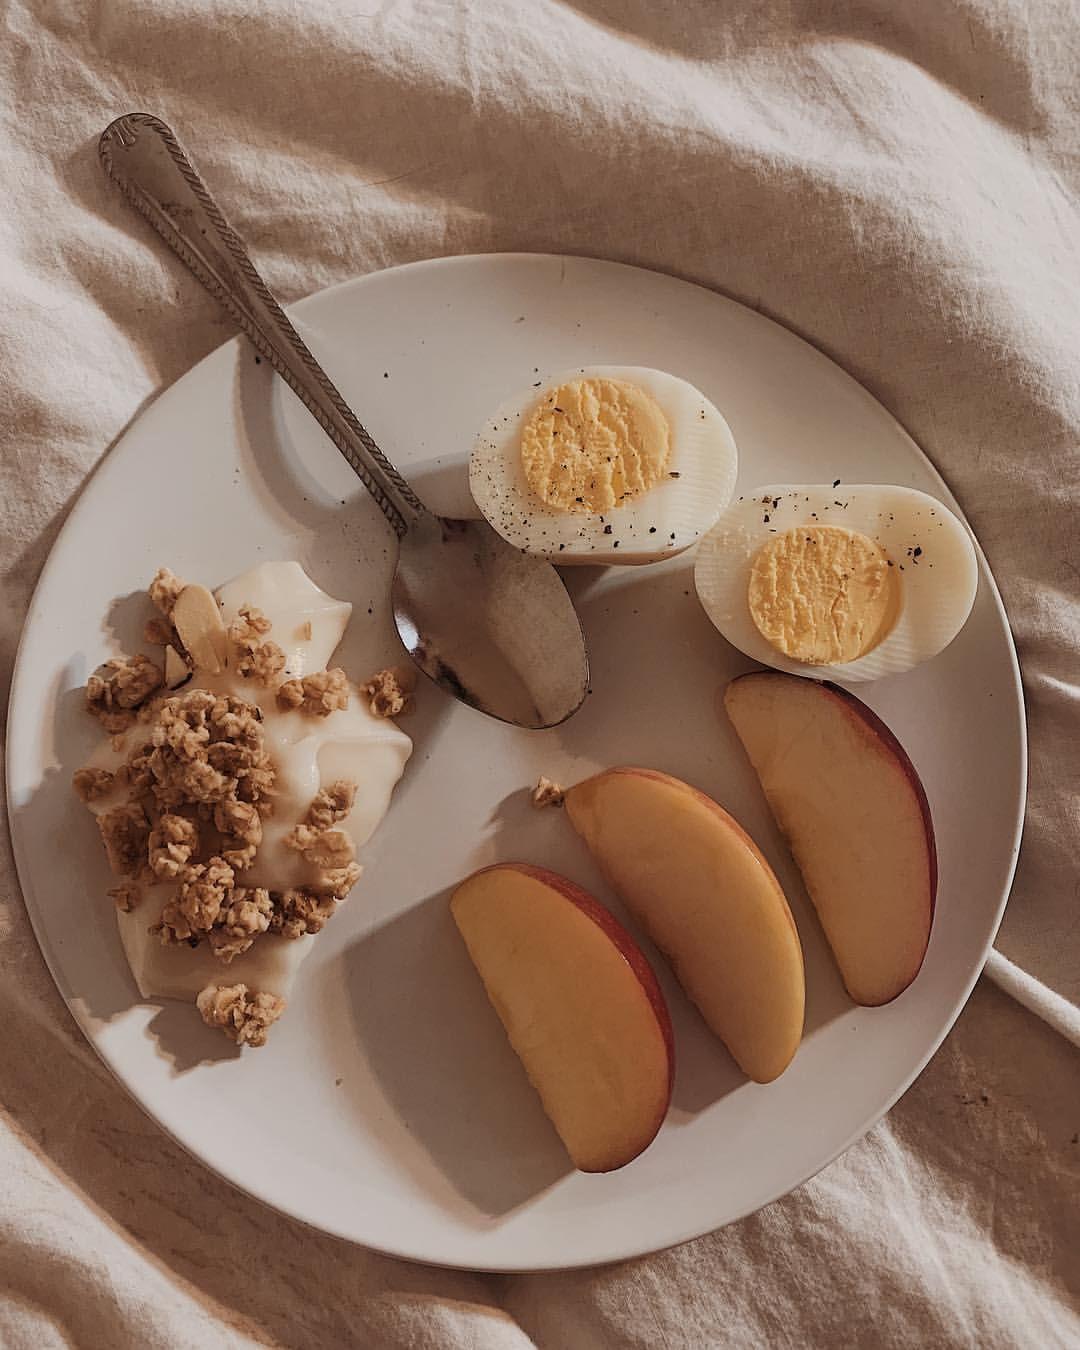 Healthy Breakfast Healthy College Snacks Healthy College Recipes